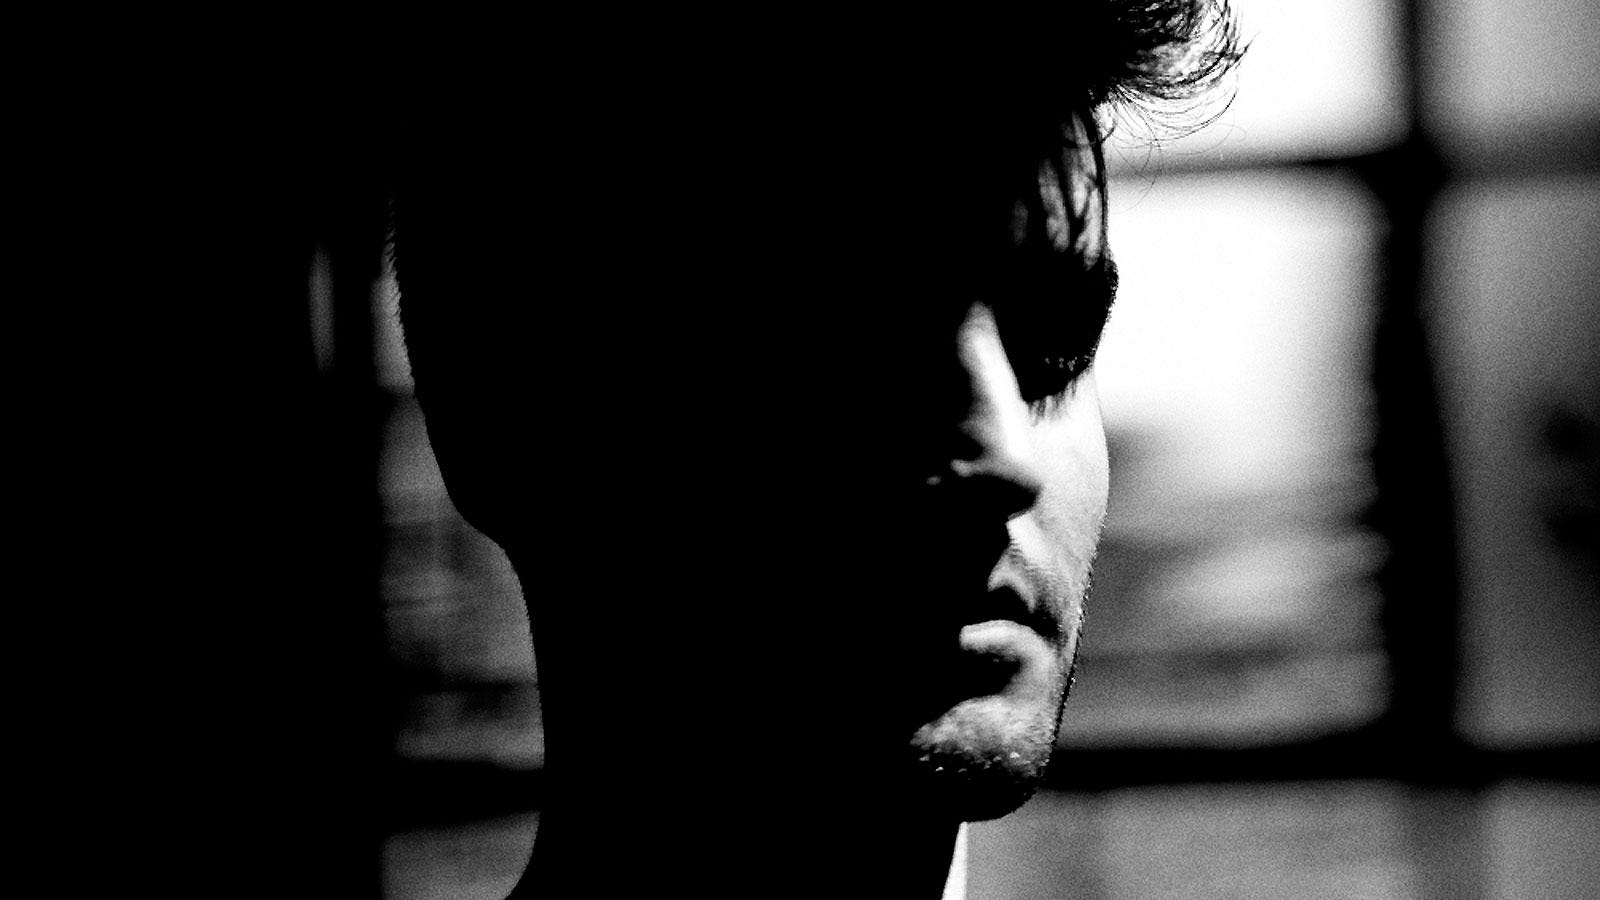 PJ Harvey - Under Ether (Nico Casal Cover)